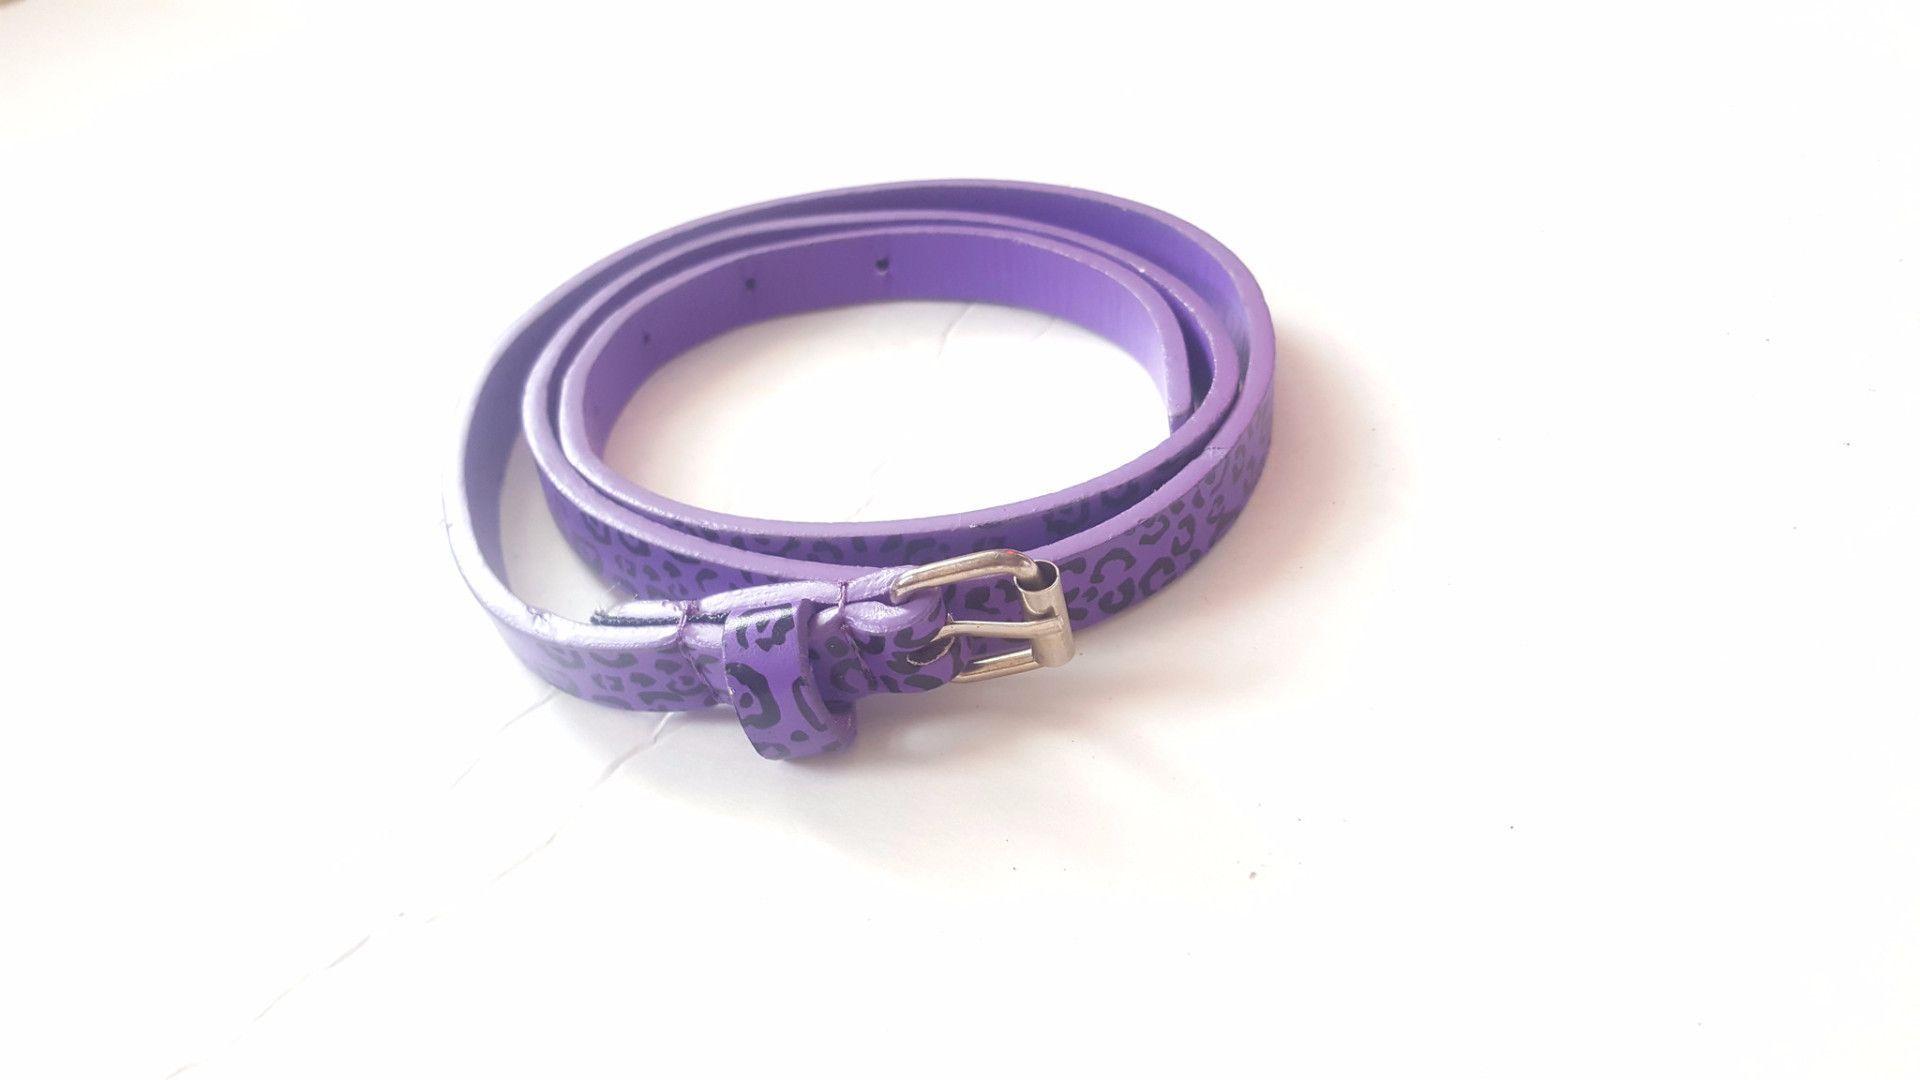 Vintage purple black cheetah animal print s skinny high waist buckle